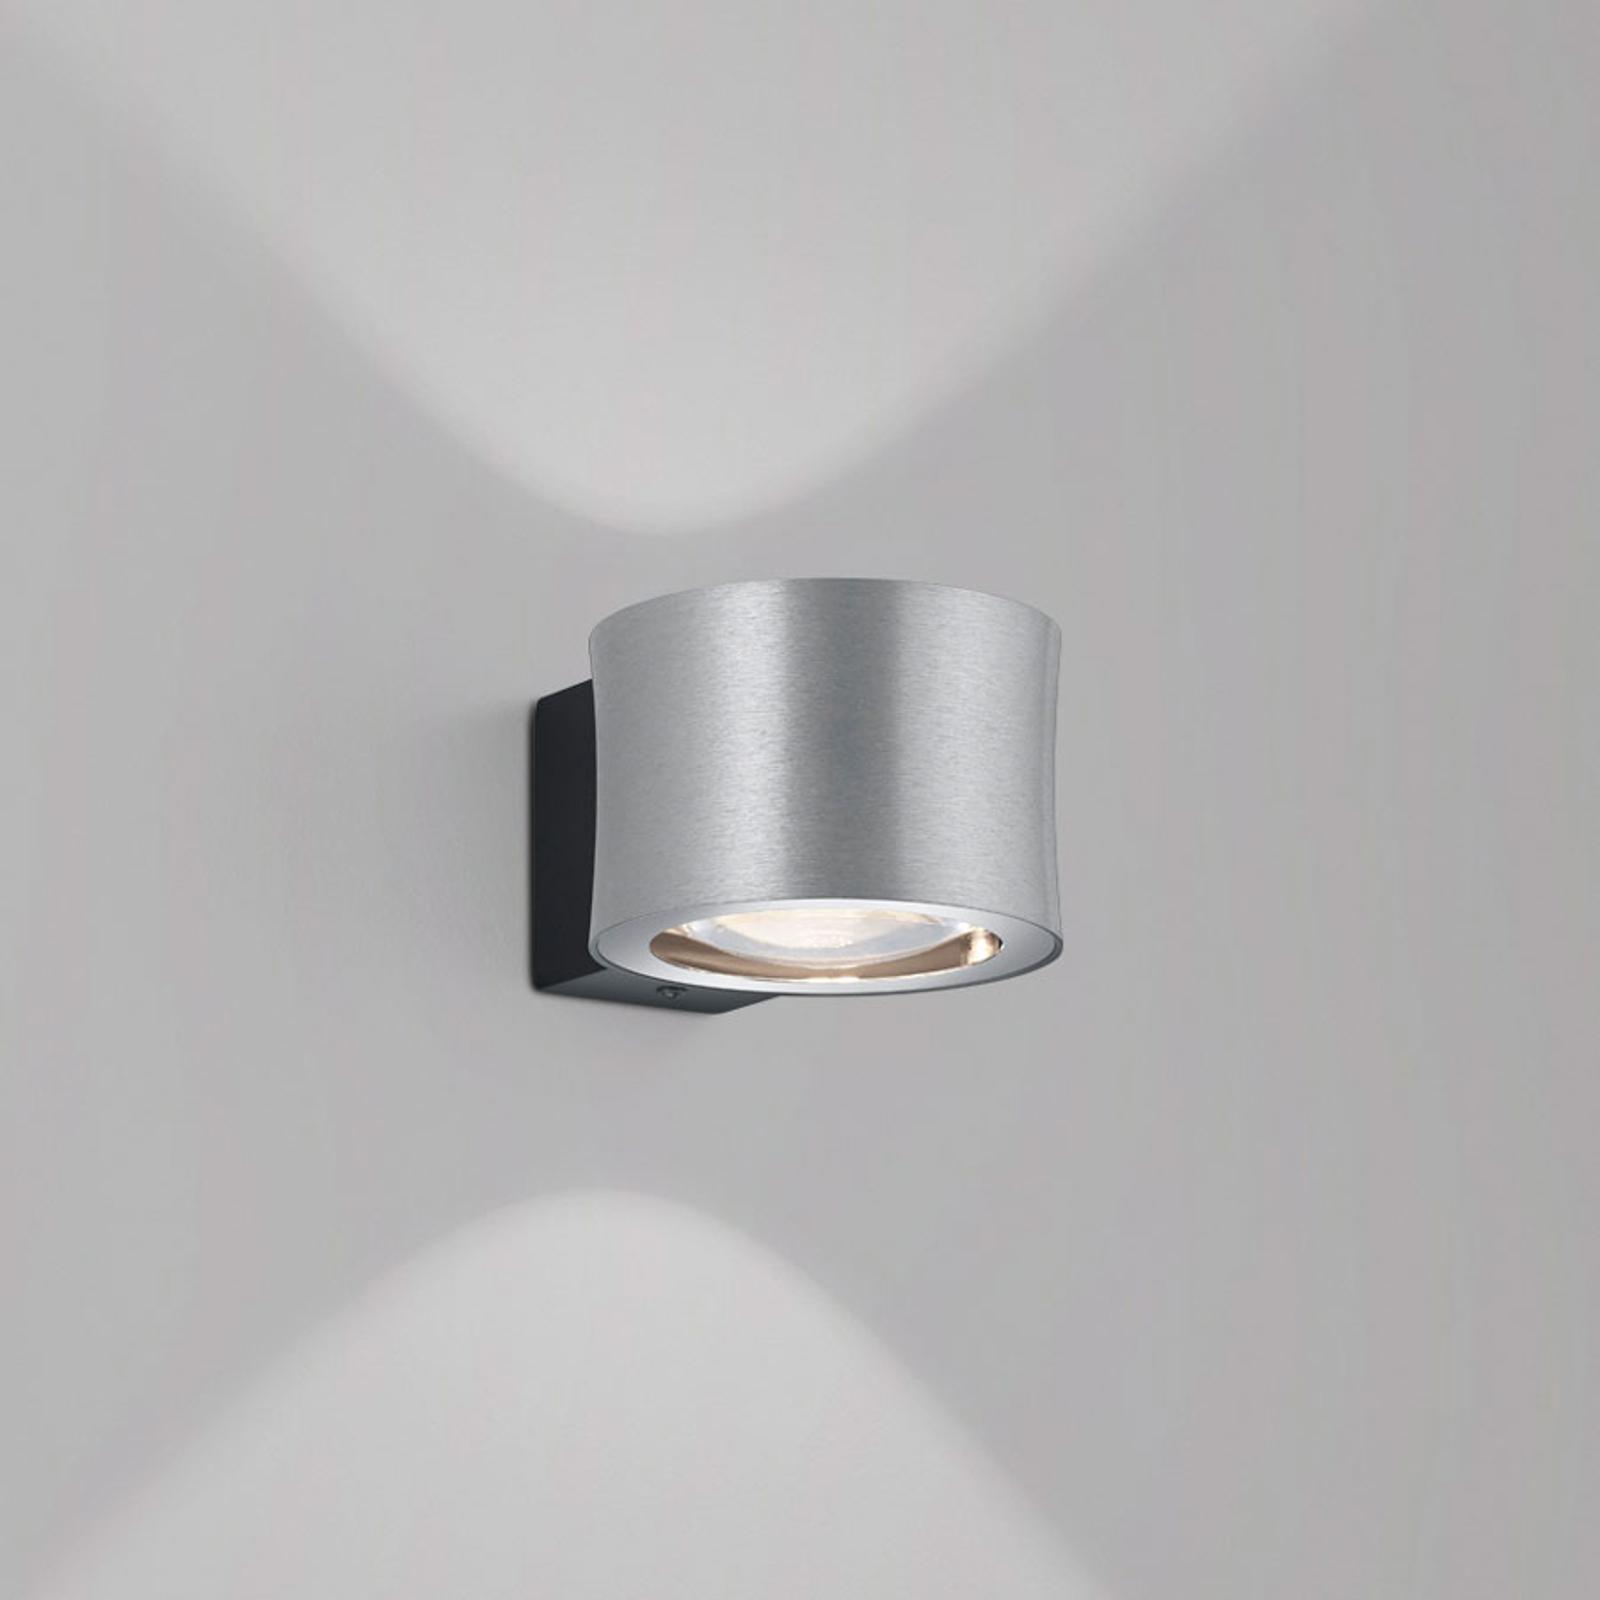 BANKAMP Impulse LED-Wandleuchte 1-flammig nickel